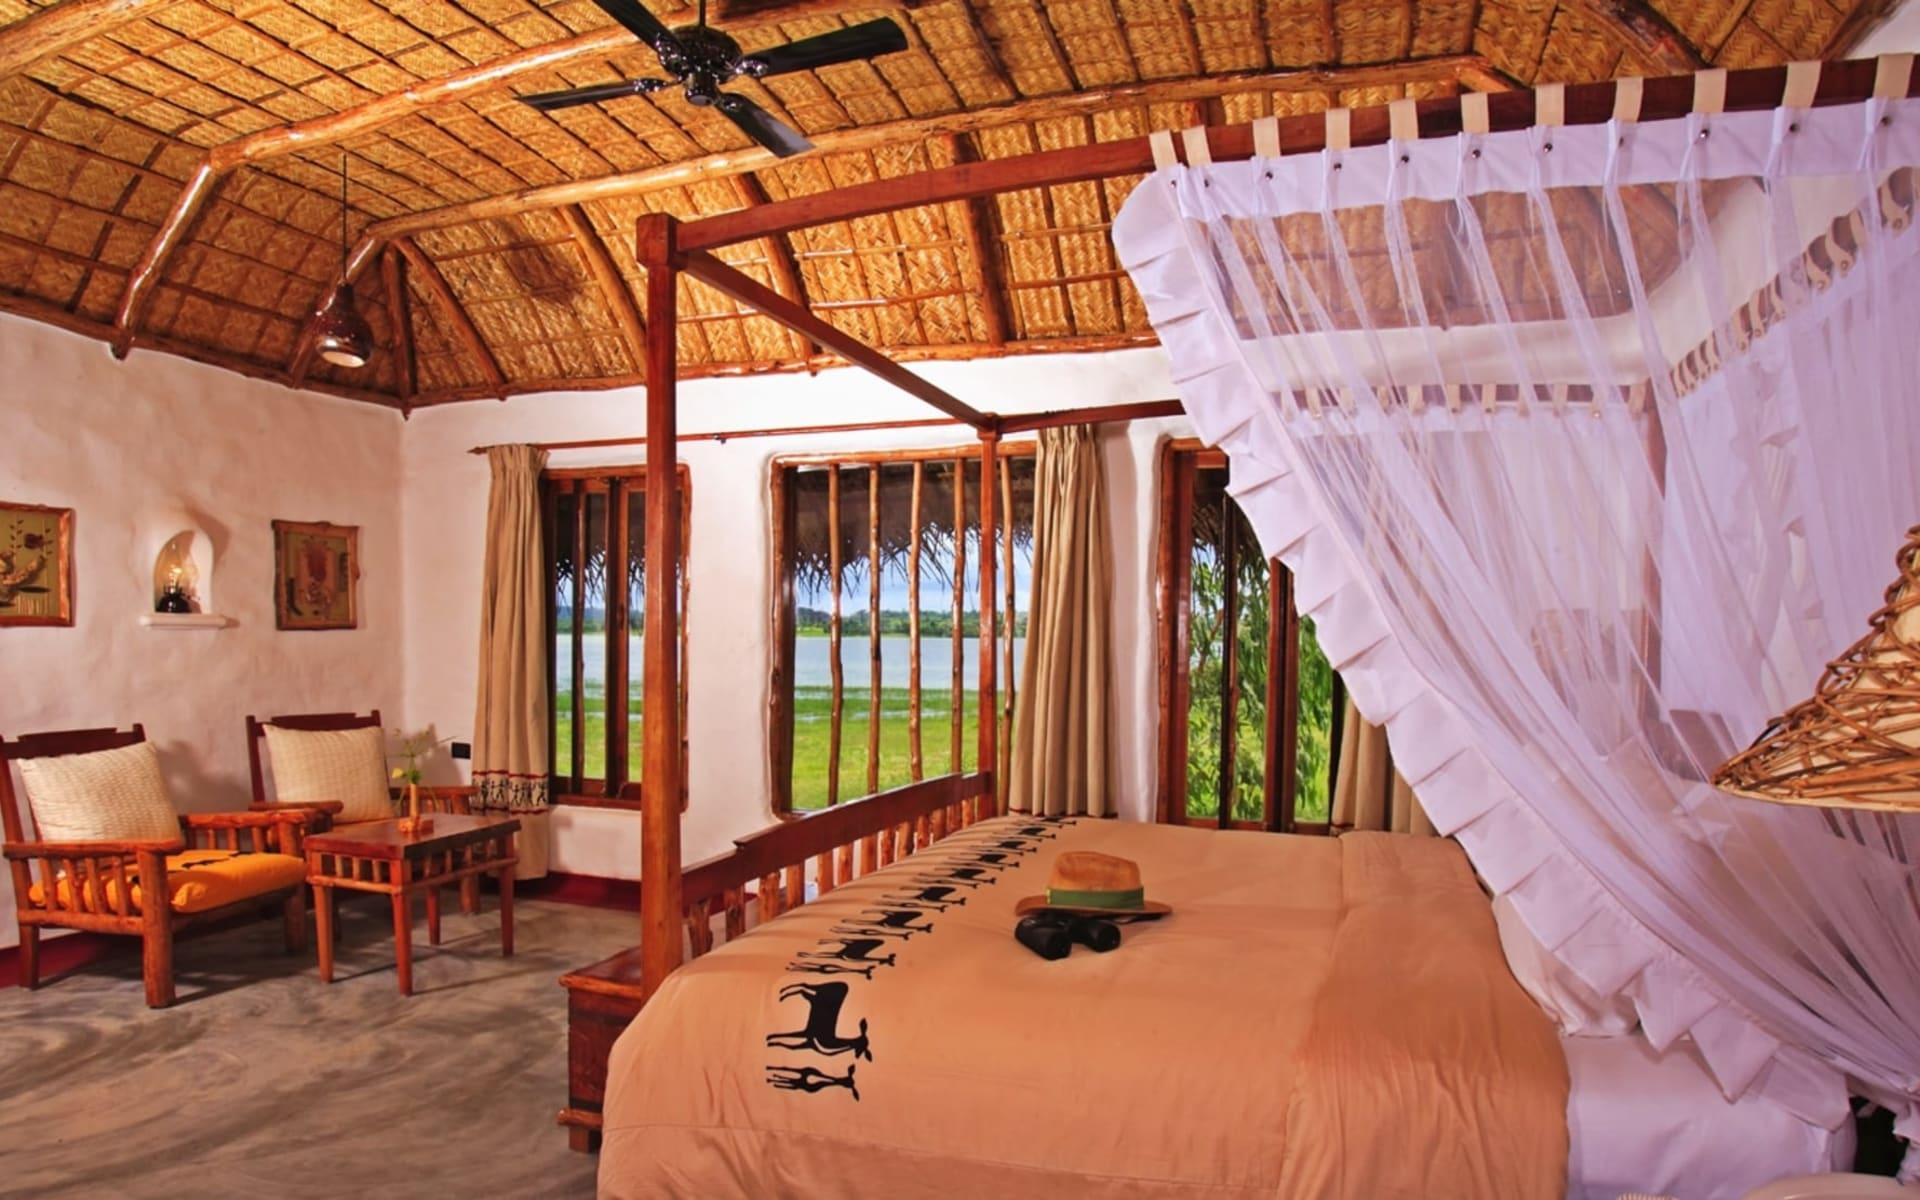 Evolve Back Kuruba Safari Lodge in Nagarhole Nationalpark: Pool Hut | Bedroom